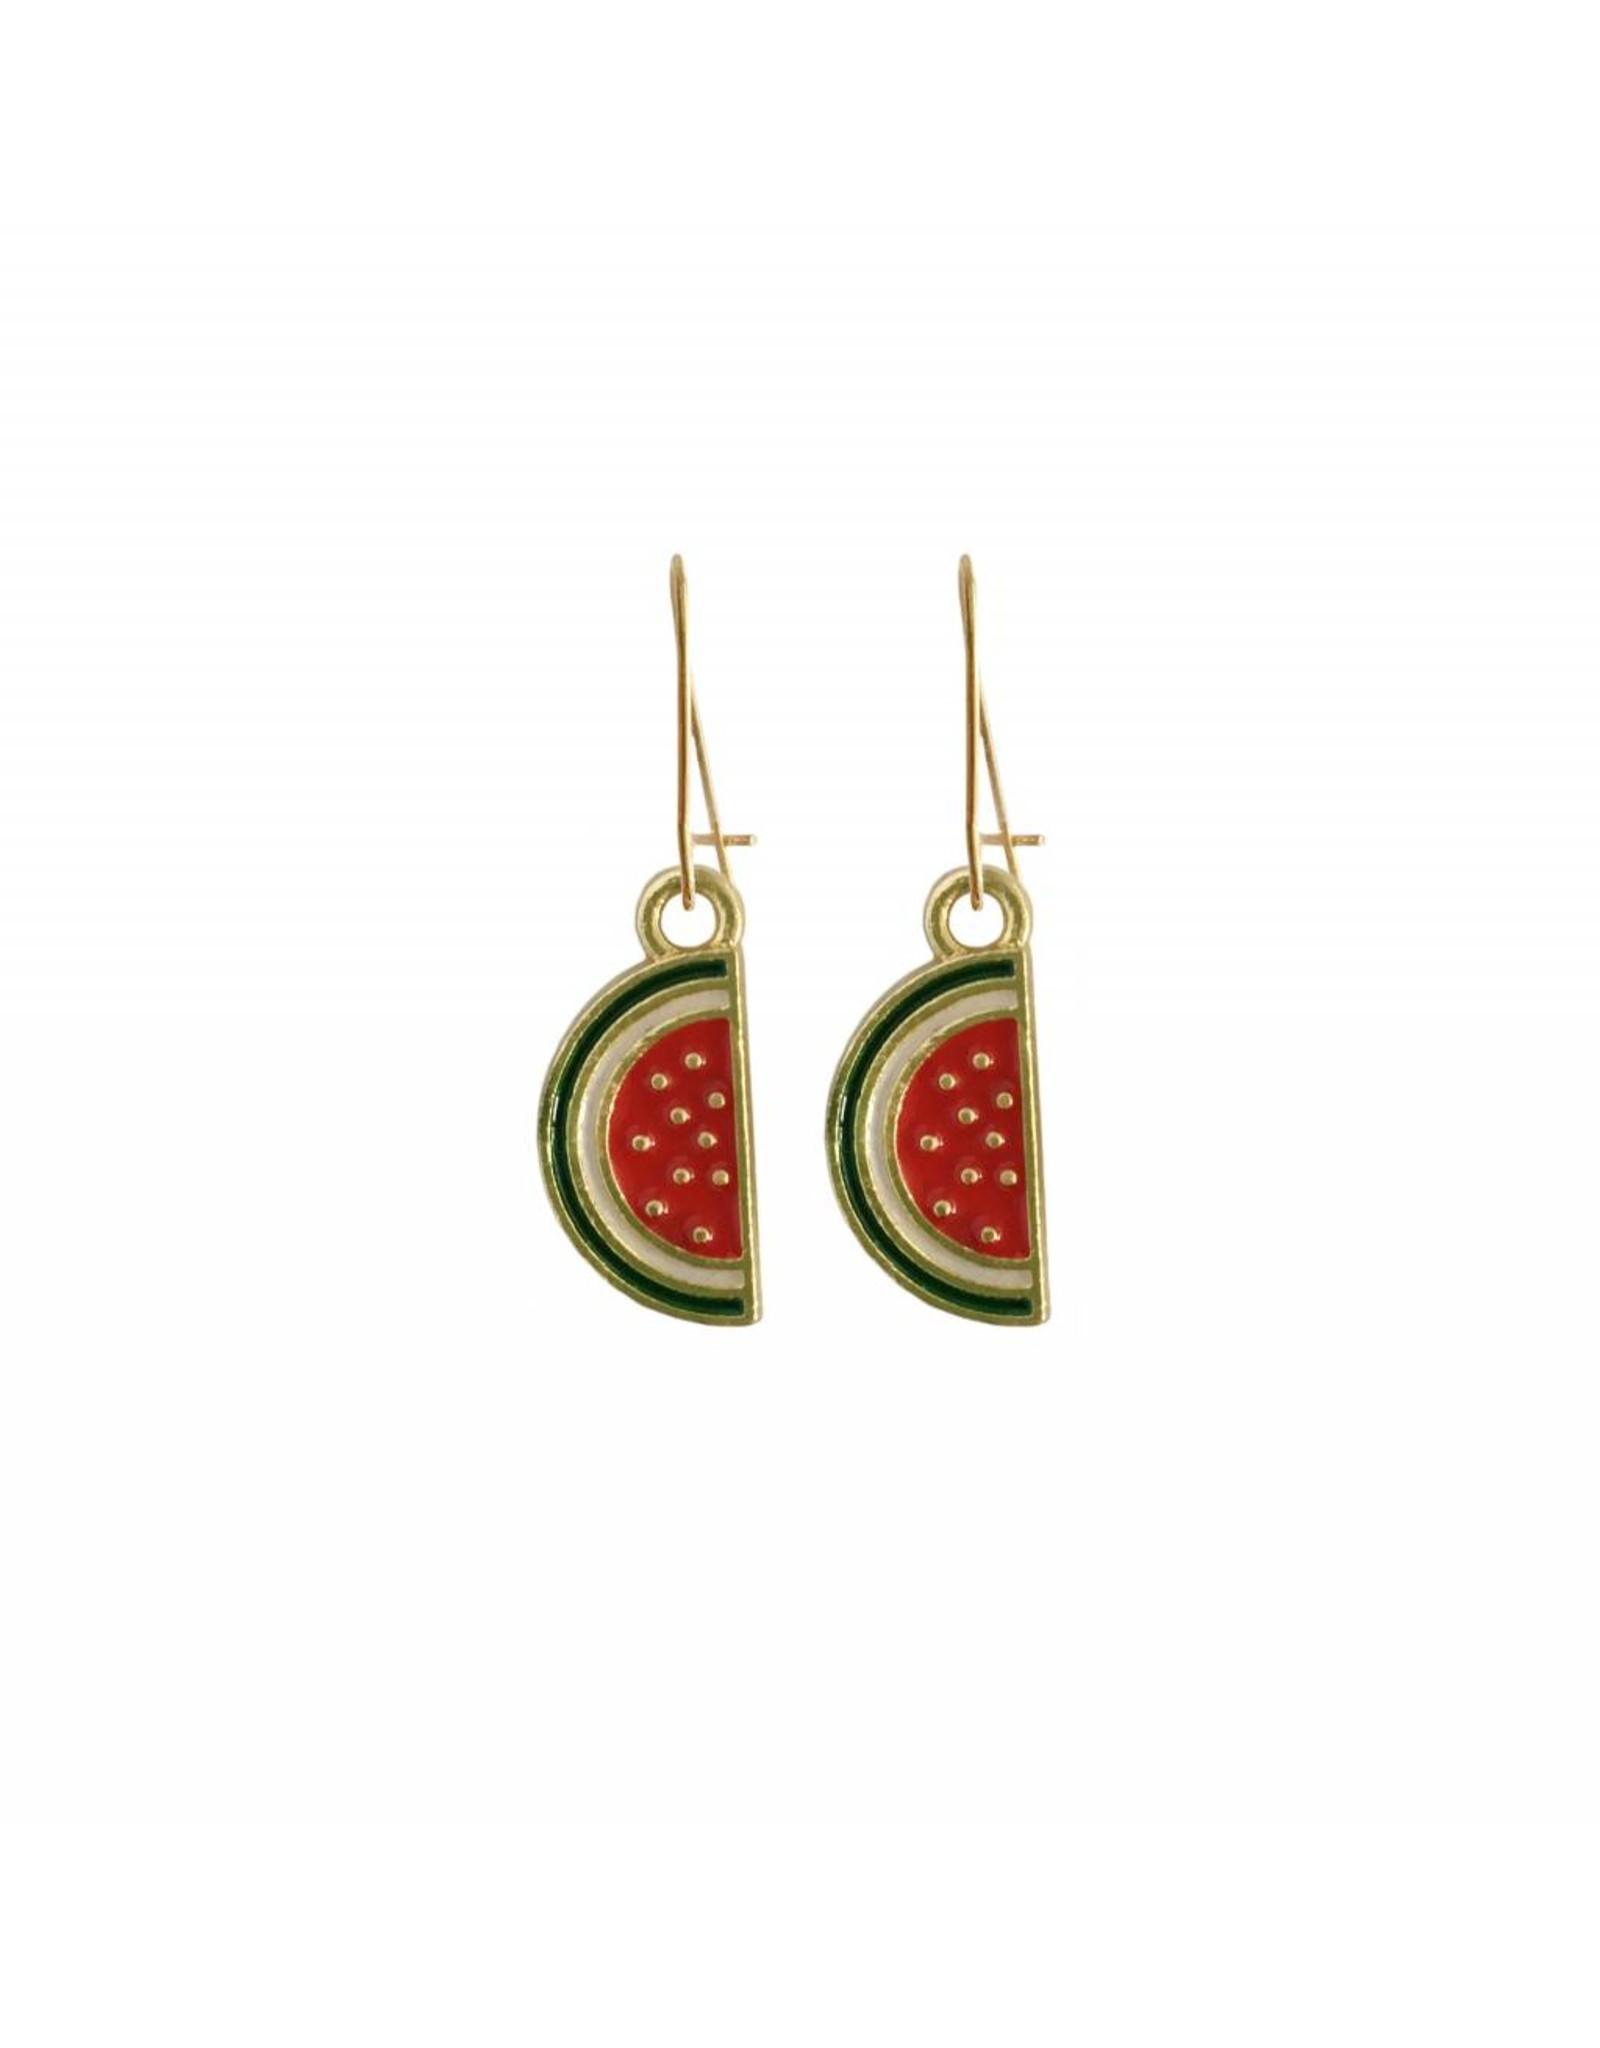 oorbEllen goudkleurig email watermeloen half